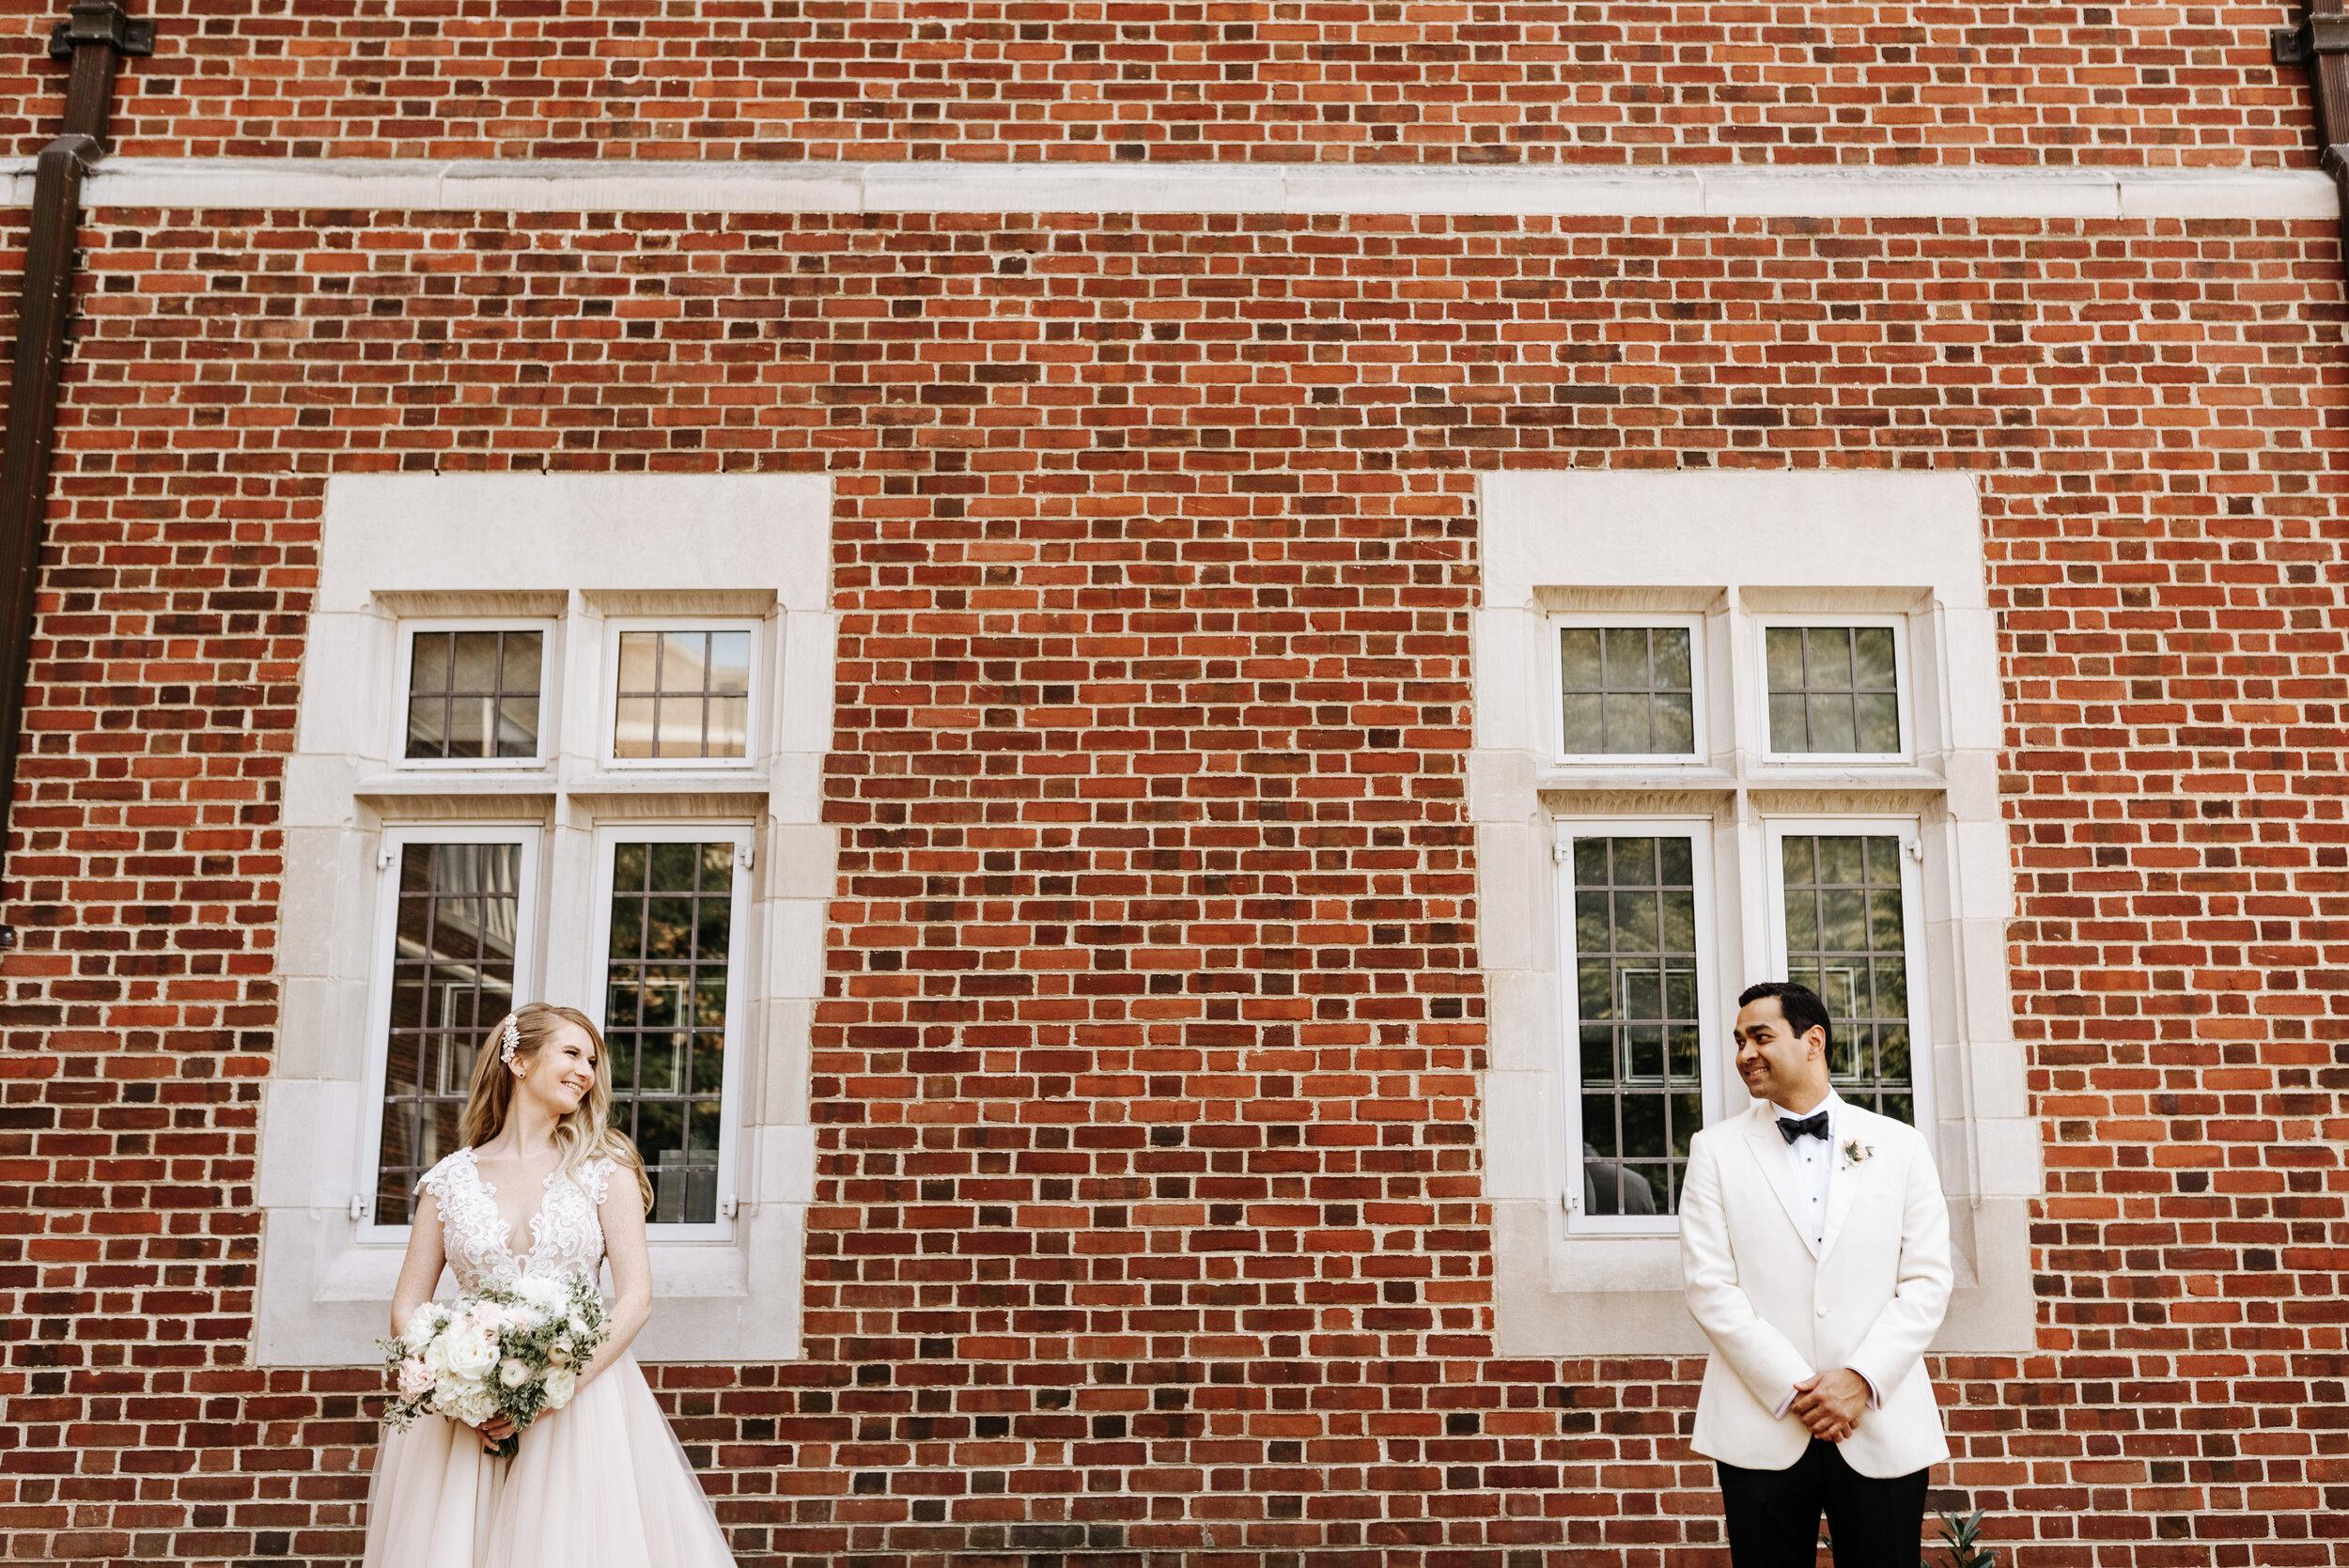 Cassie-Mrunal-Wedding-Quirk-Hotel-John-Marshall-Ballrooms-Richmond-Virginia-Photography-by-V-50.jpg